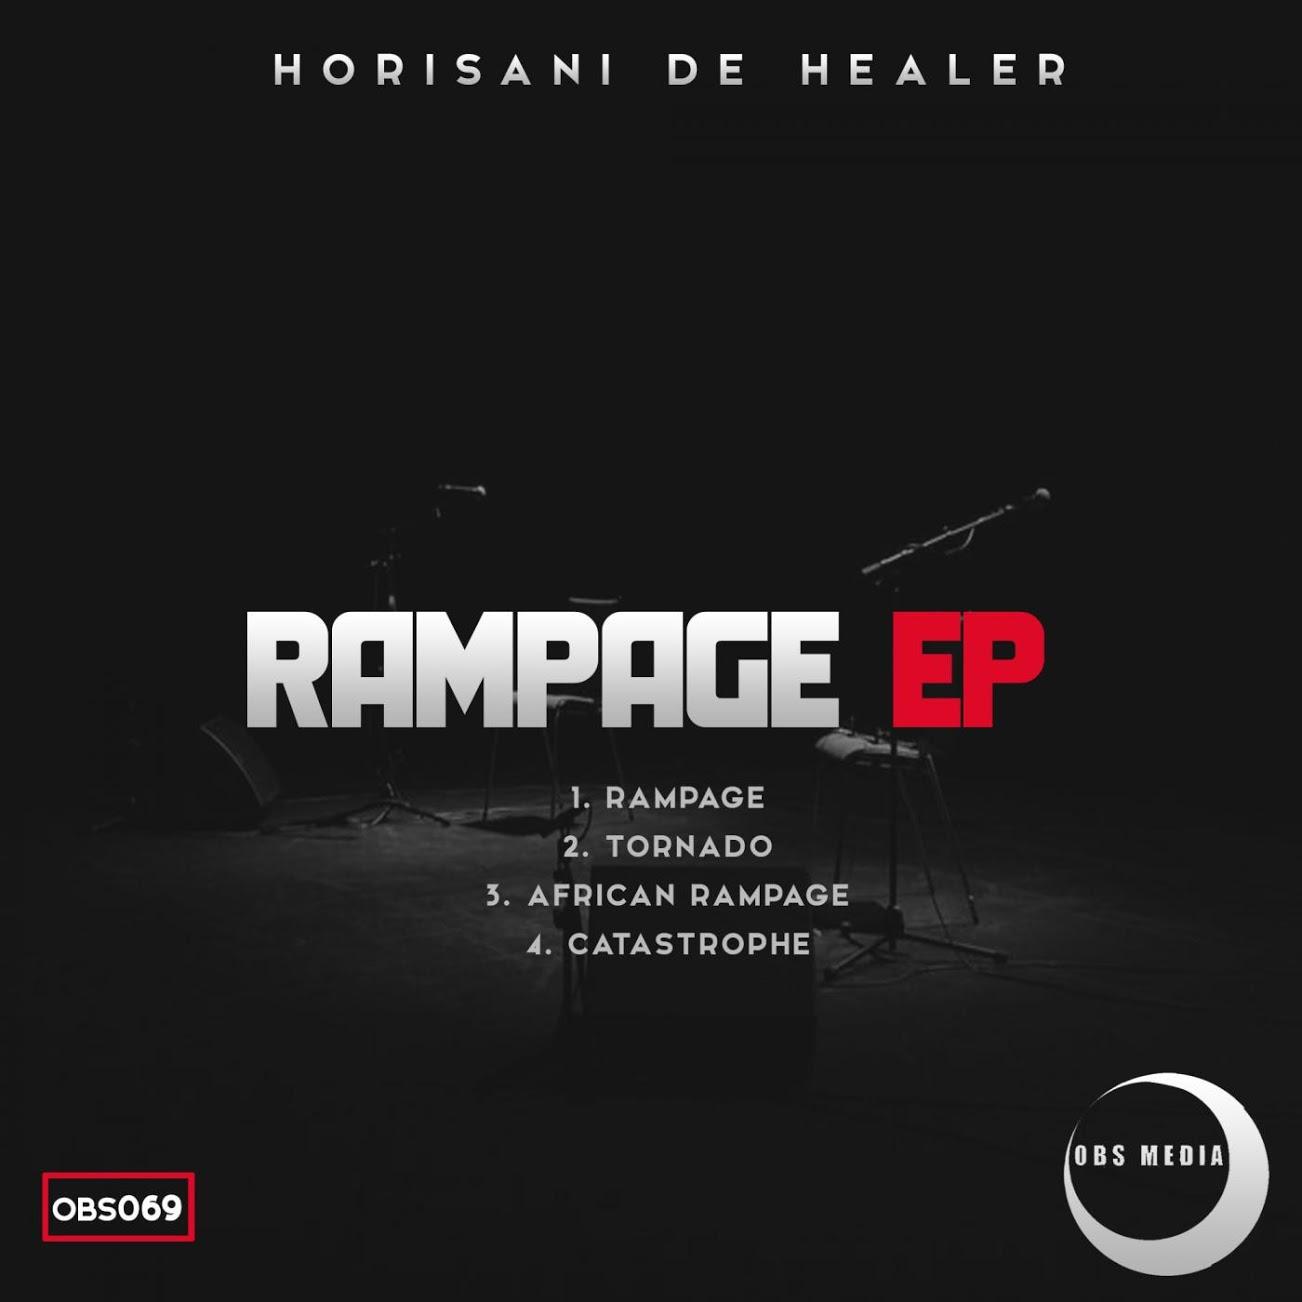 Horisani De Healer Rampage EP - EP:Horisani De Healer – Rampage